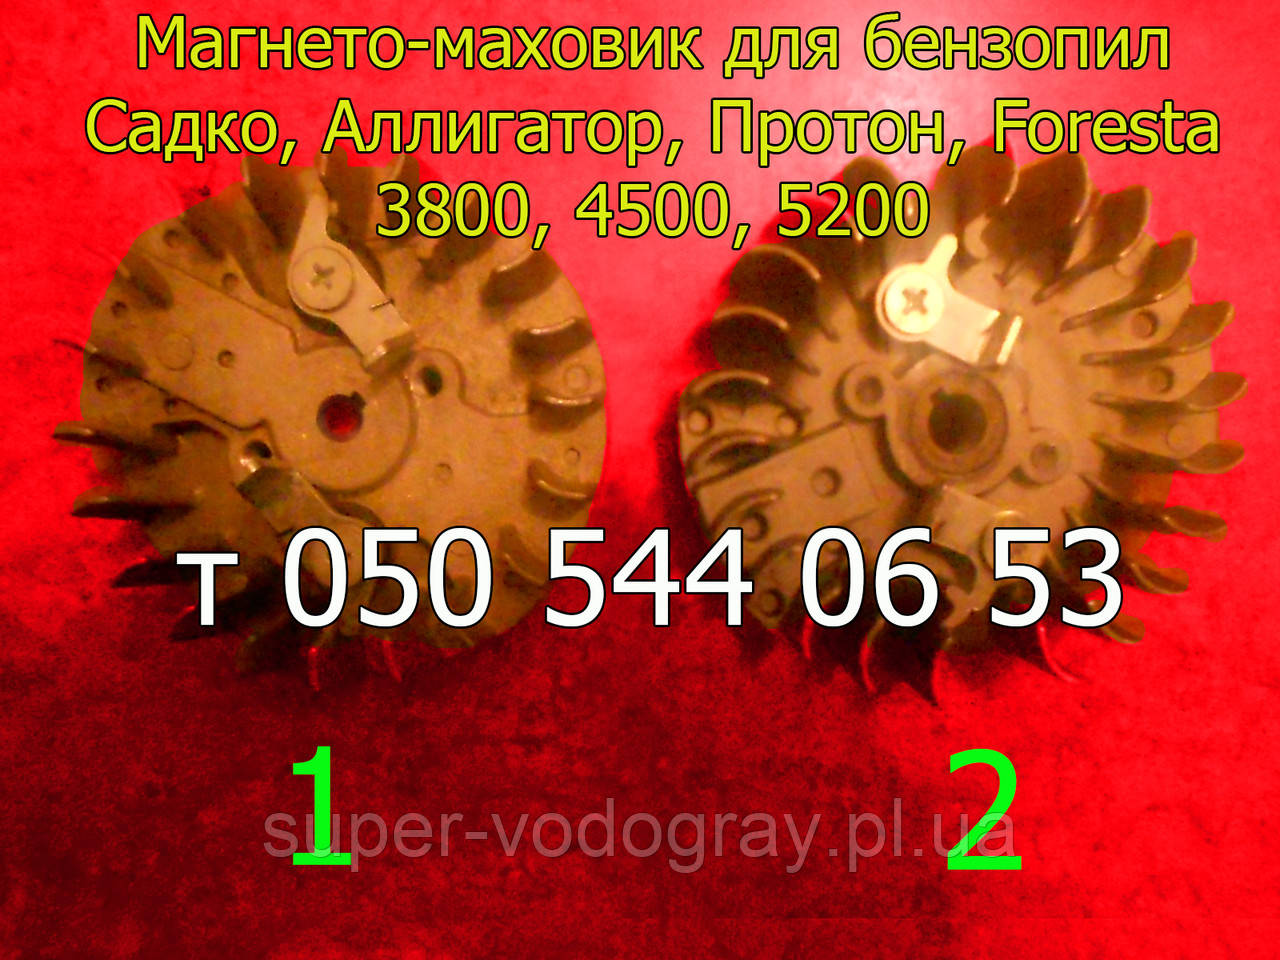 Магнето - маховик для бензопилы Аллигатор, Садко, Протон, Foresta